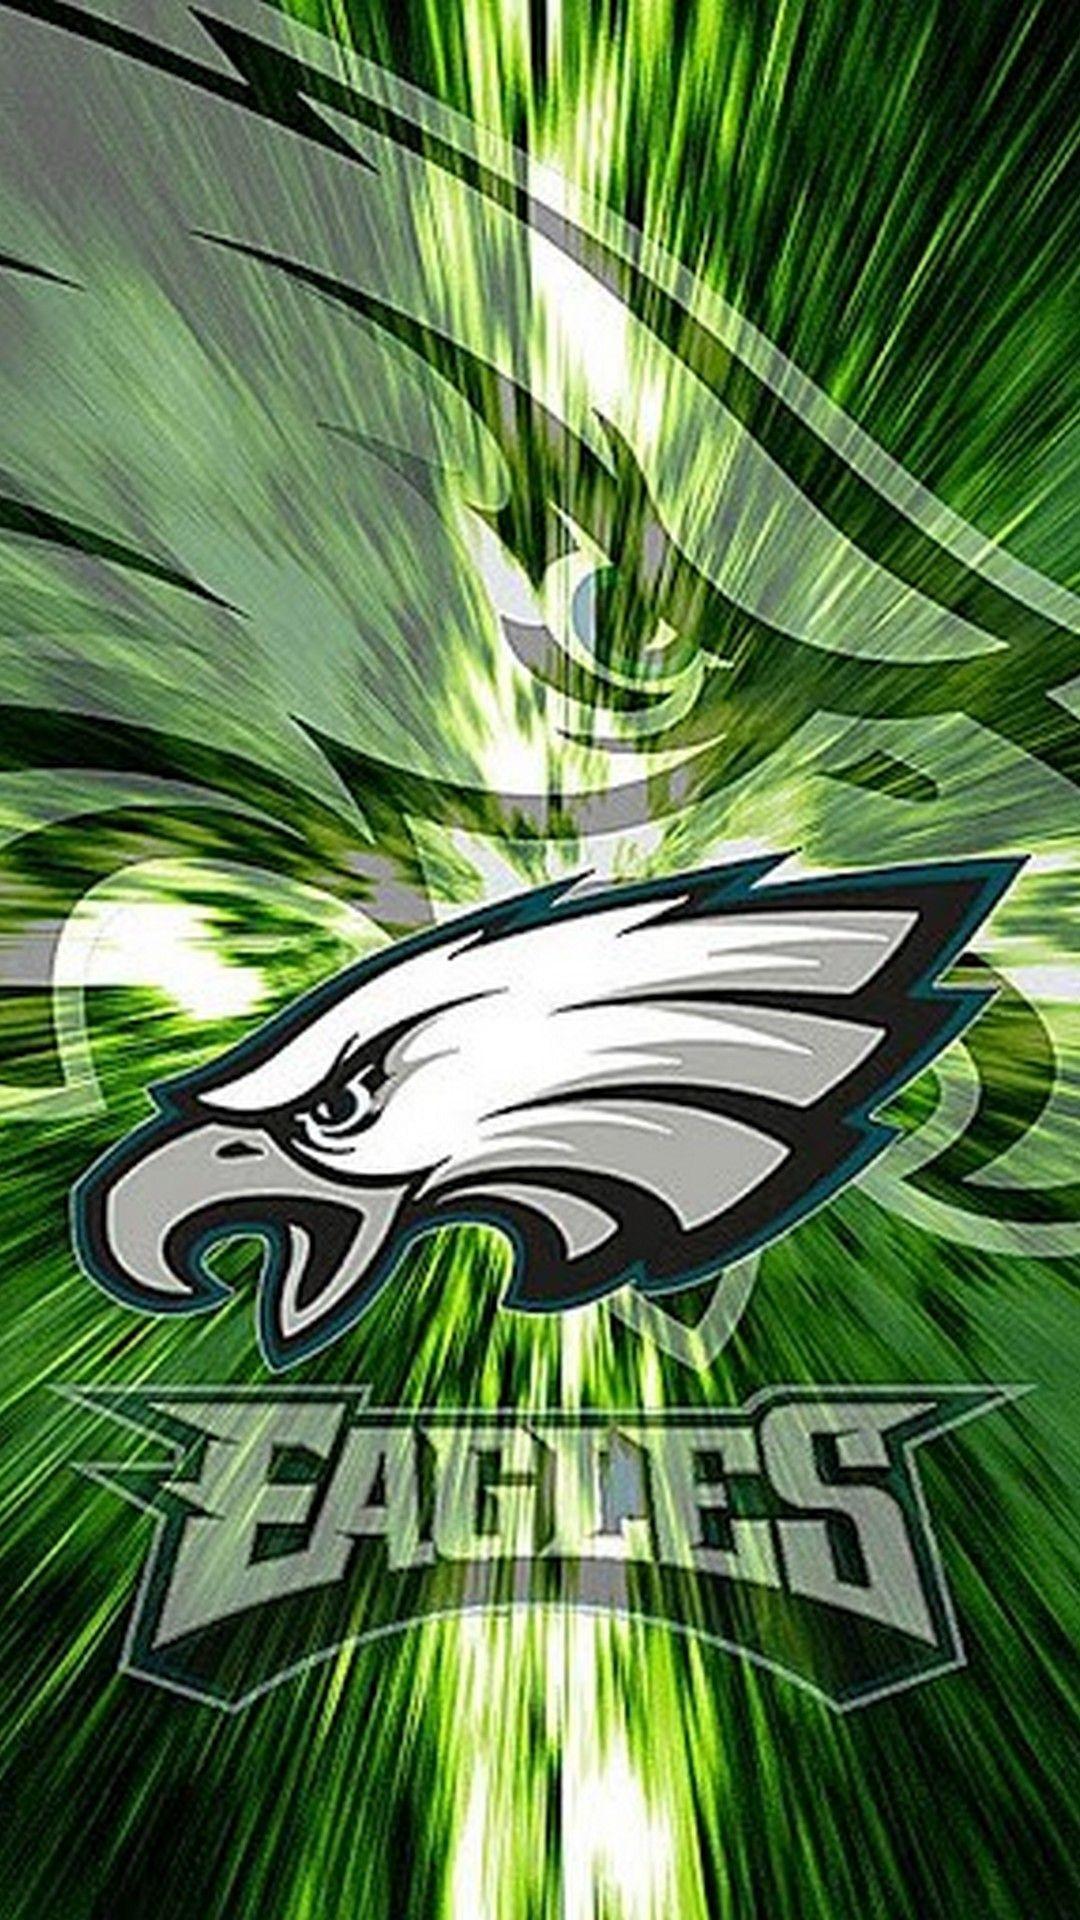 Philadelphia Eagles Iphone 8 Wallpaper 2021 Nfl Football Wallpapers Philadelphia Eagles Wallpaper Philadelphia Eagles Football Philadelphia Eagles Fans